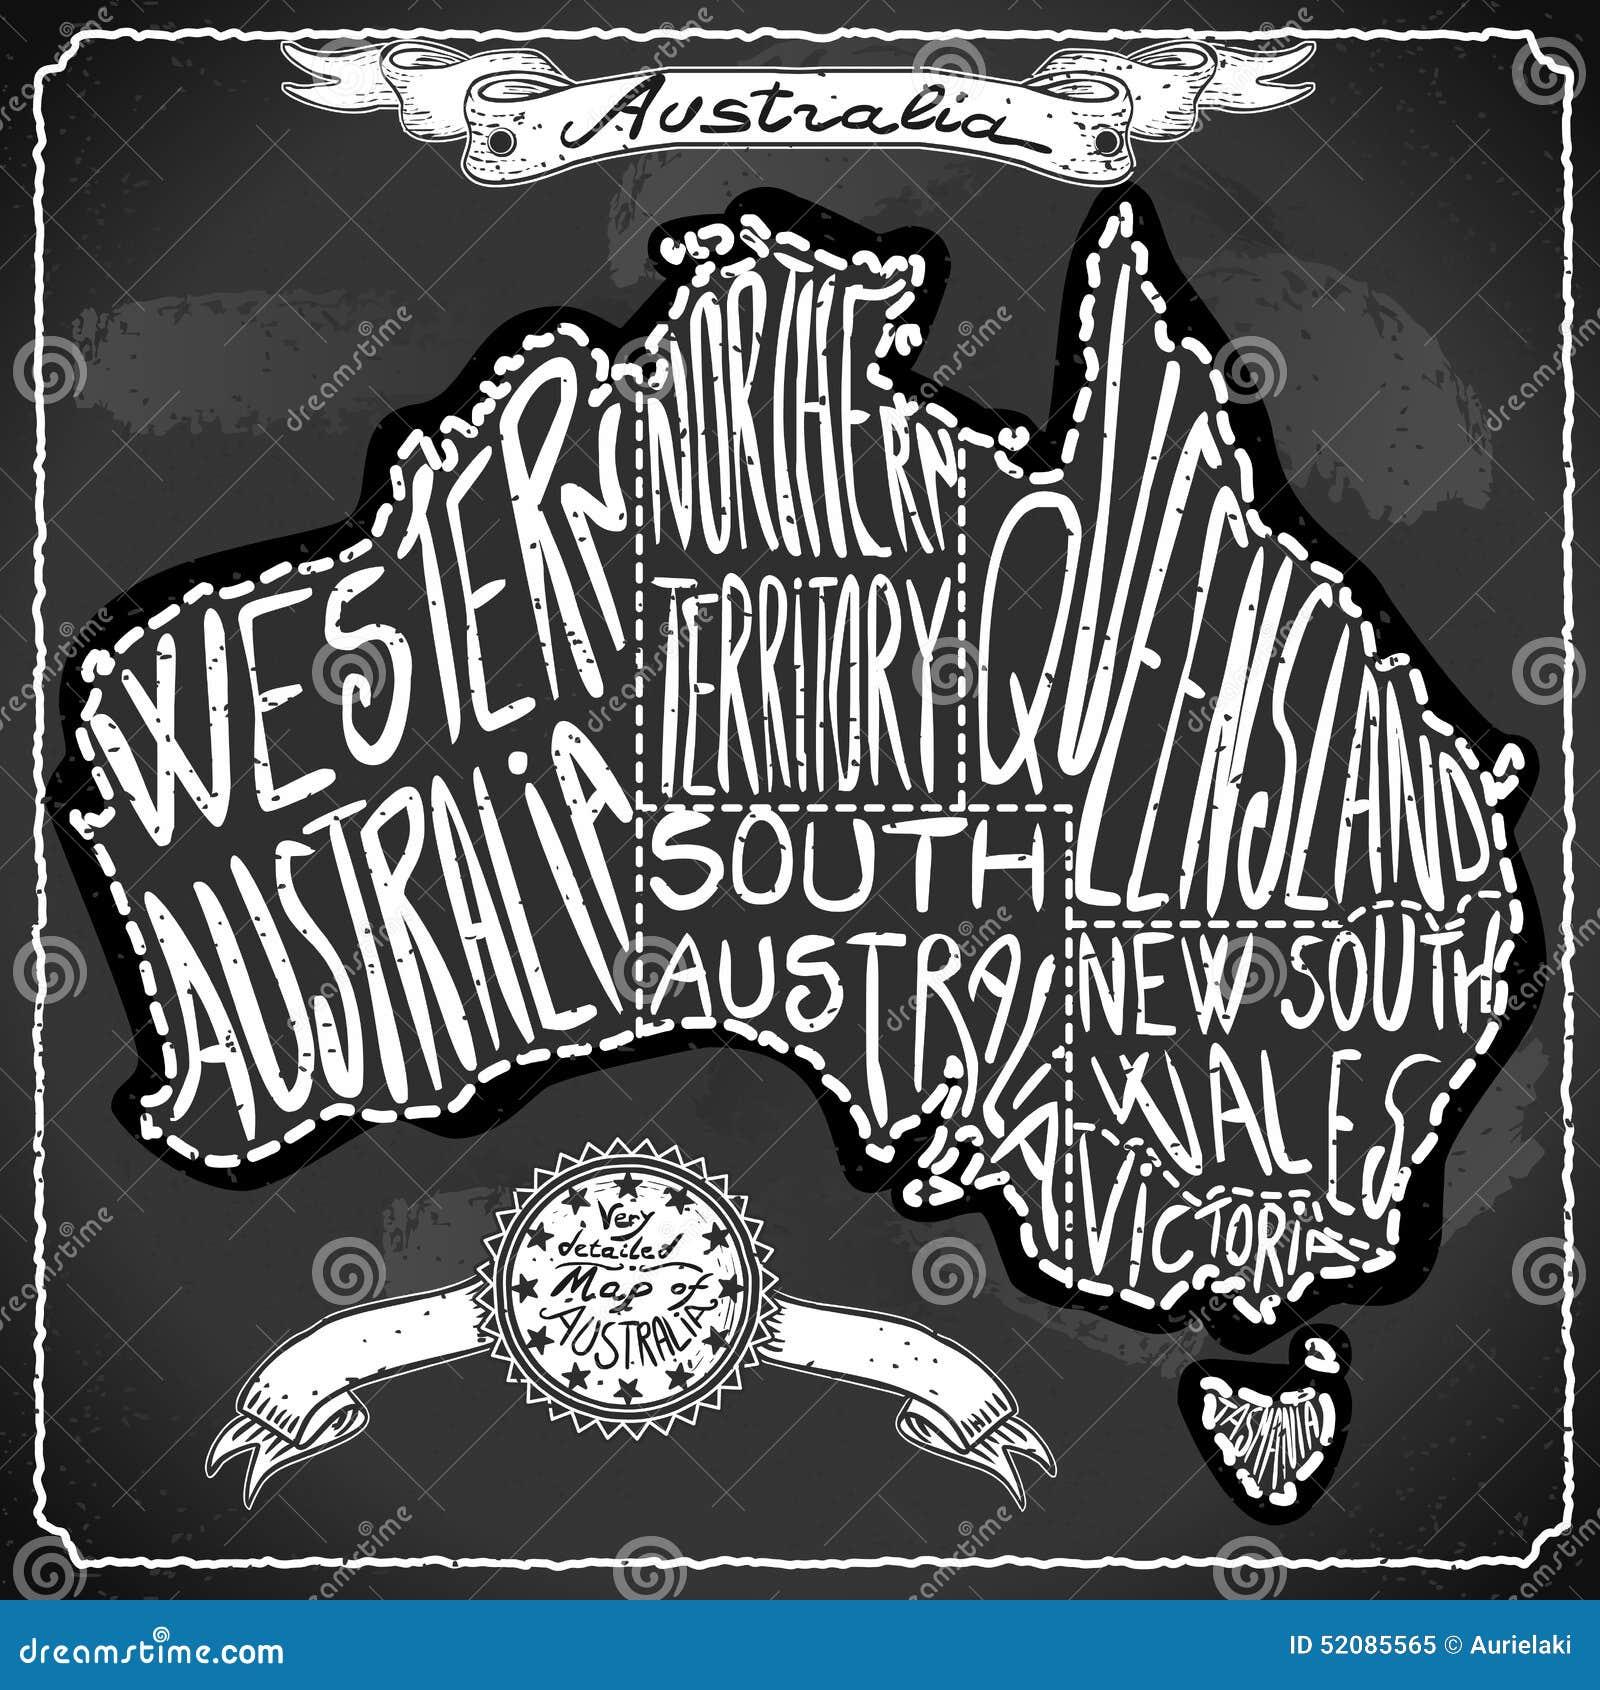 Australia map on vintage handwritten blackboard stock vector australia map on vintage handwritten blackboard gumiabroncs Image collections